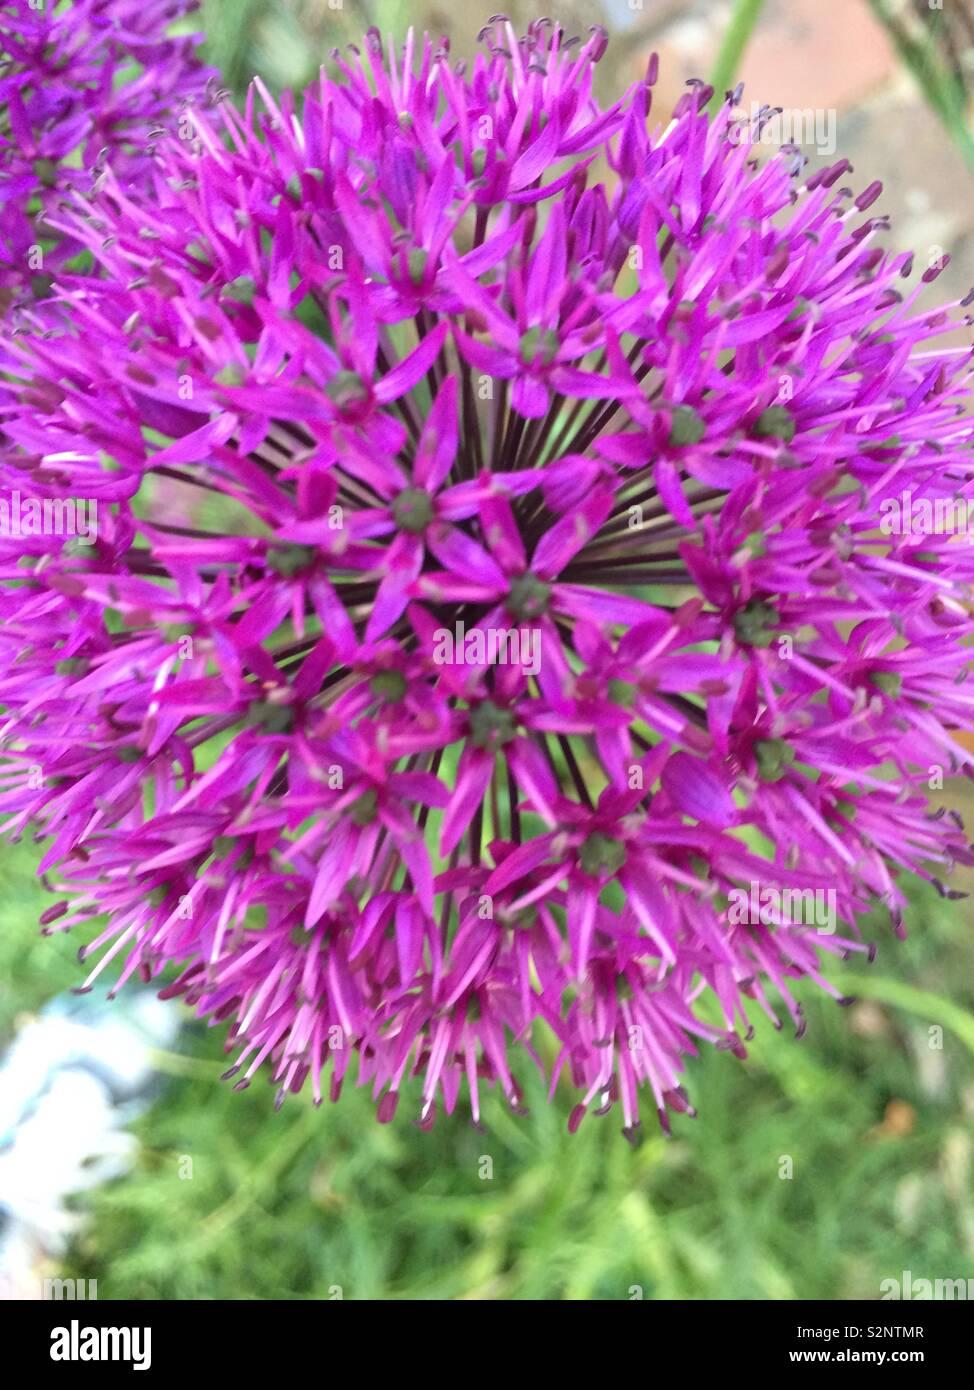 Purple Pom Pom flower - Stock Image